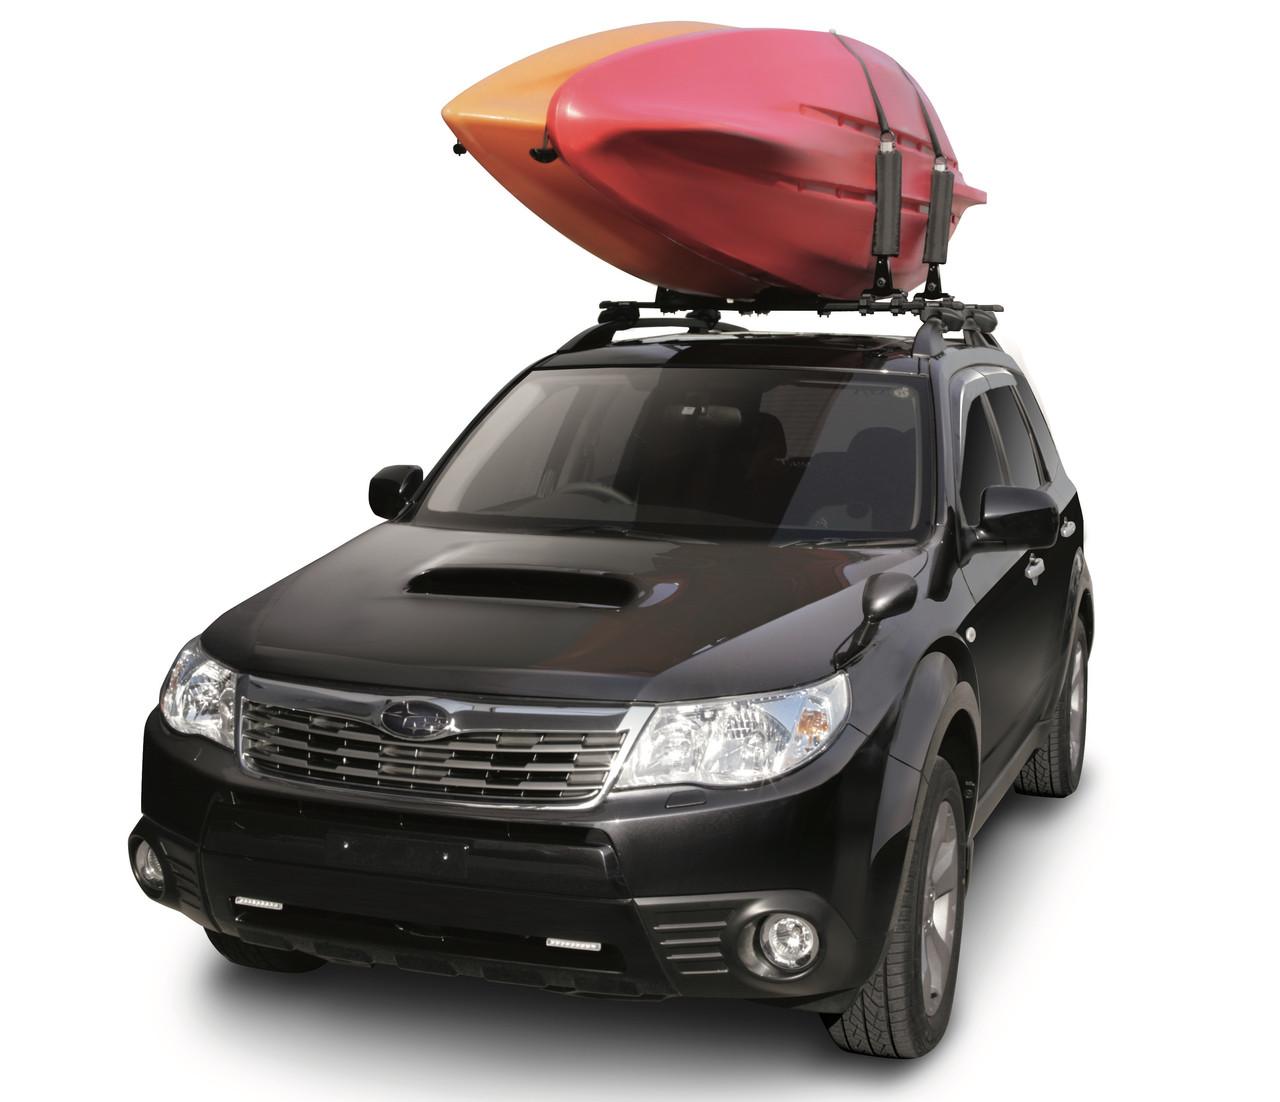 Two Kayak Roof Rack Inno Storeyourboard Com